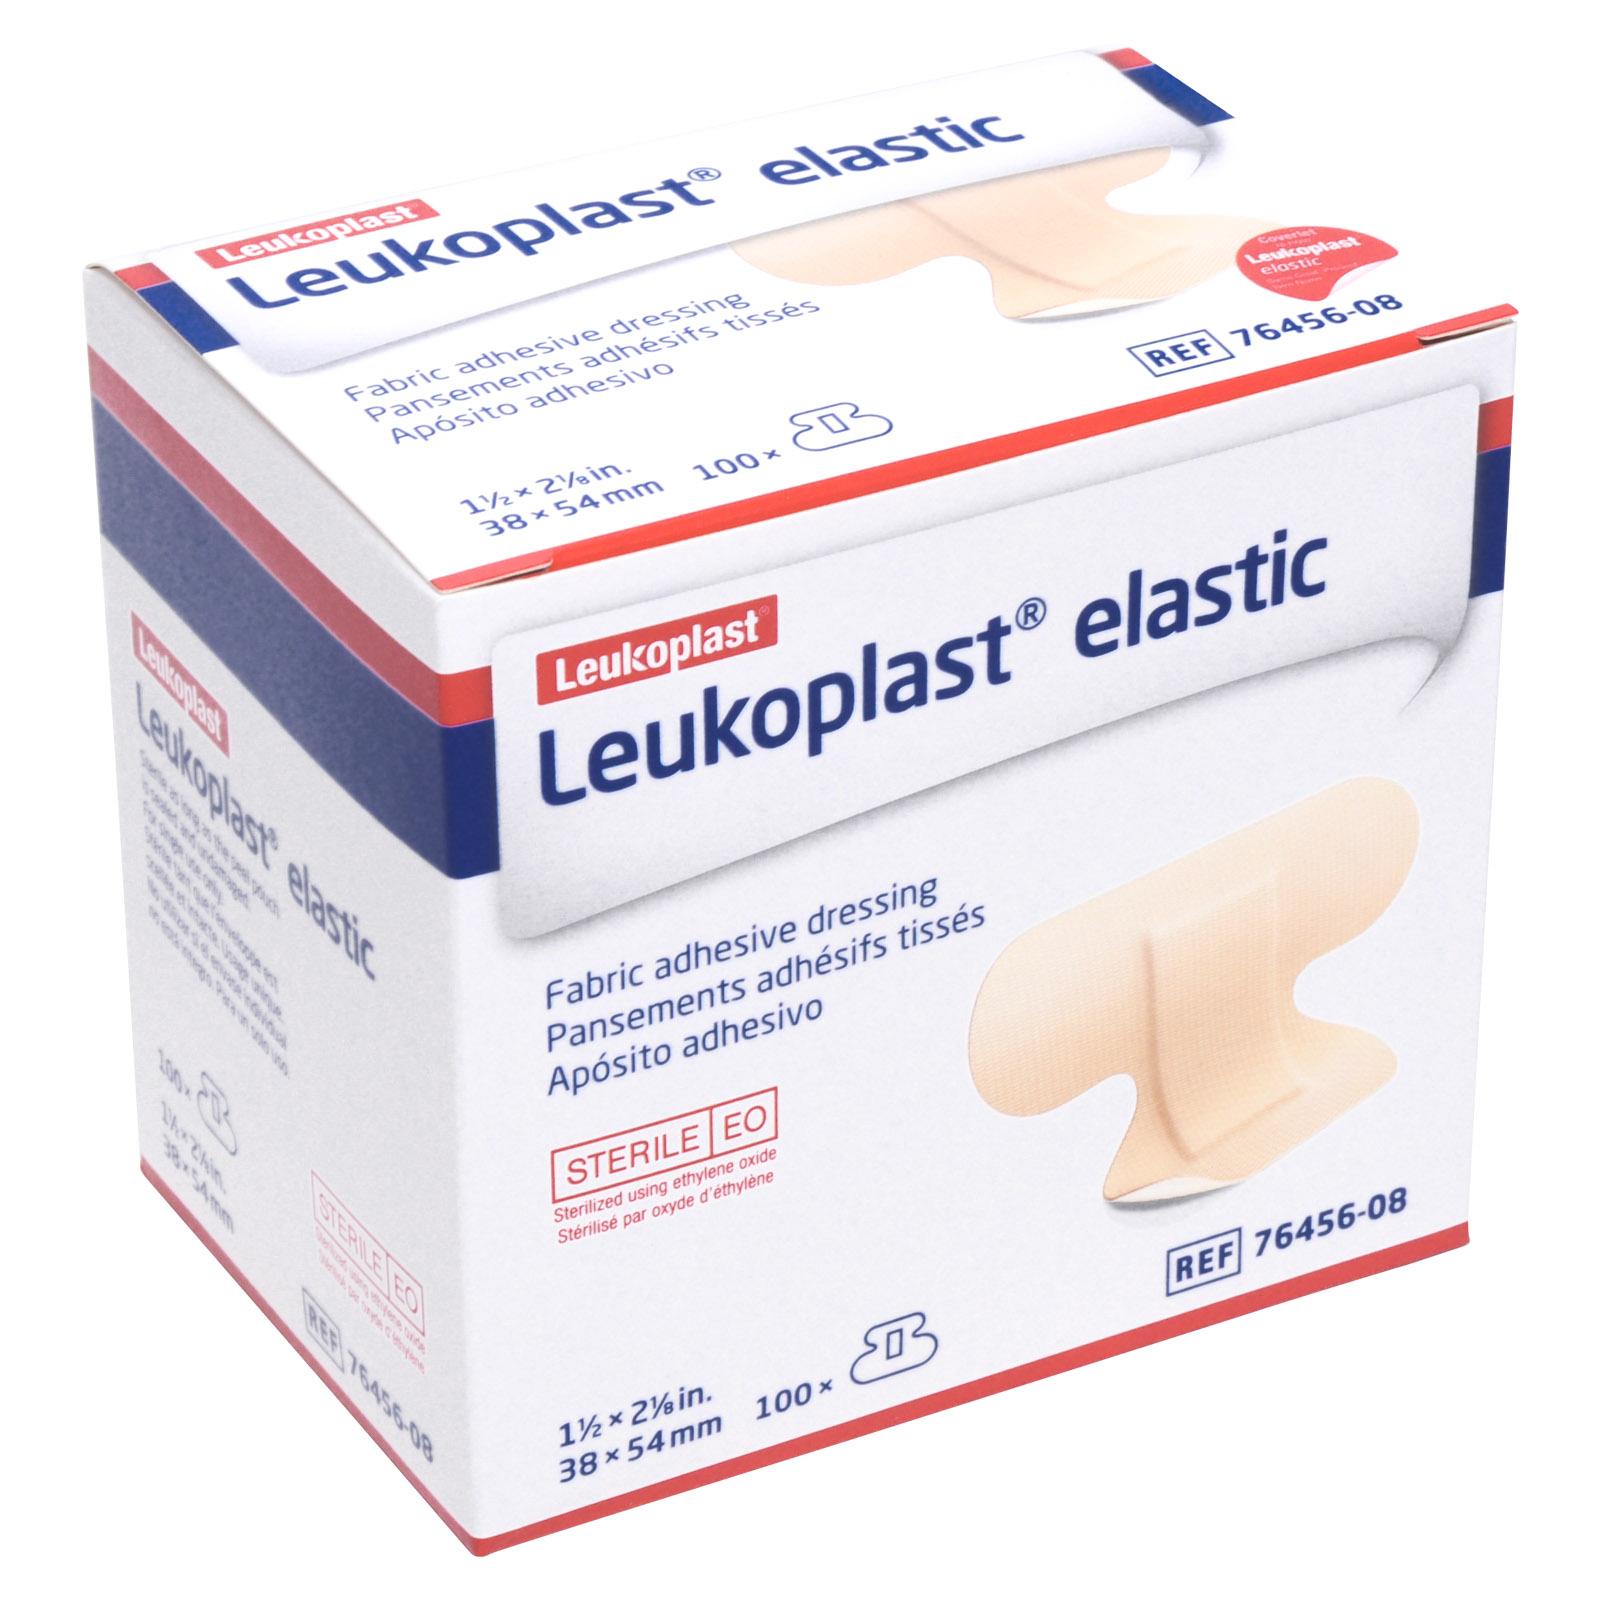 Coverlet Small Fingertip Bandage 100 Box Mfasco Health Safety